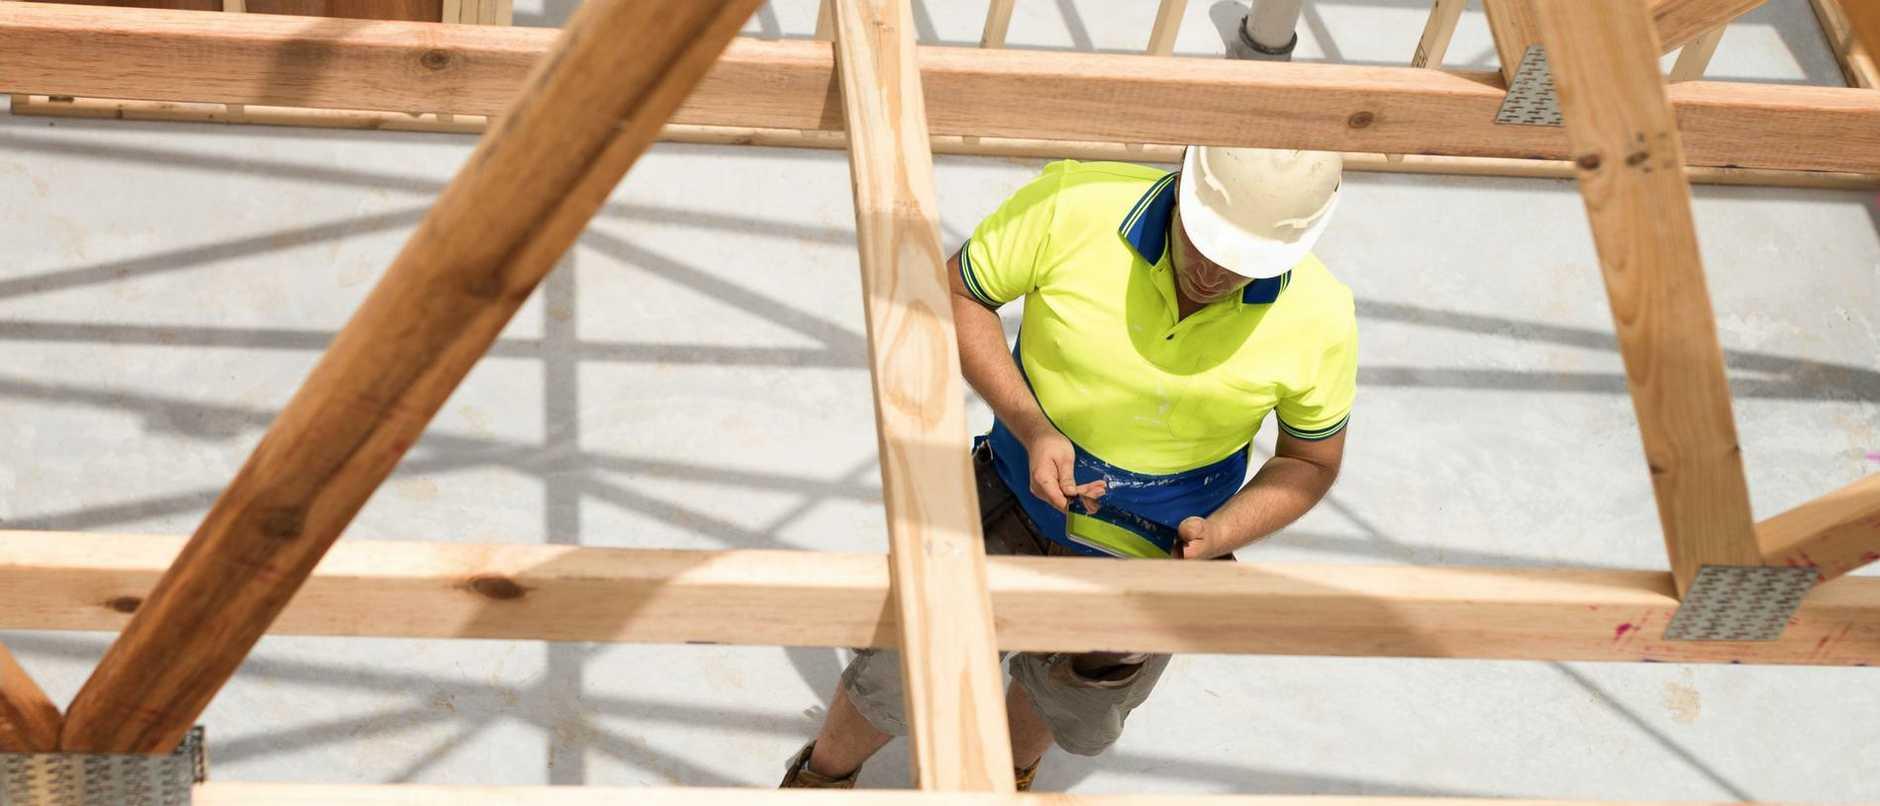 Builder checking plan on digital tablet